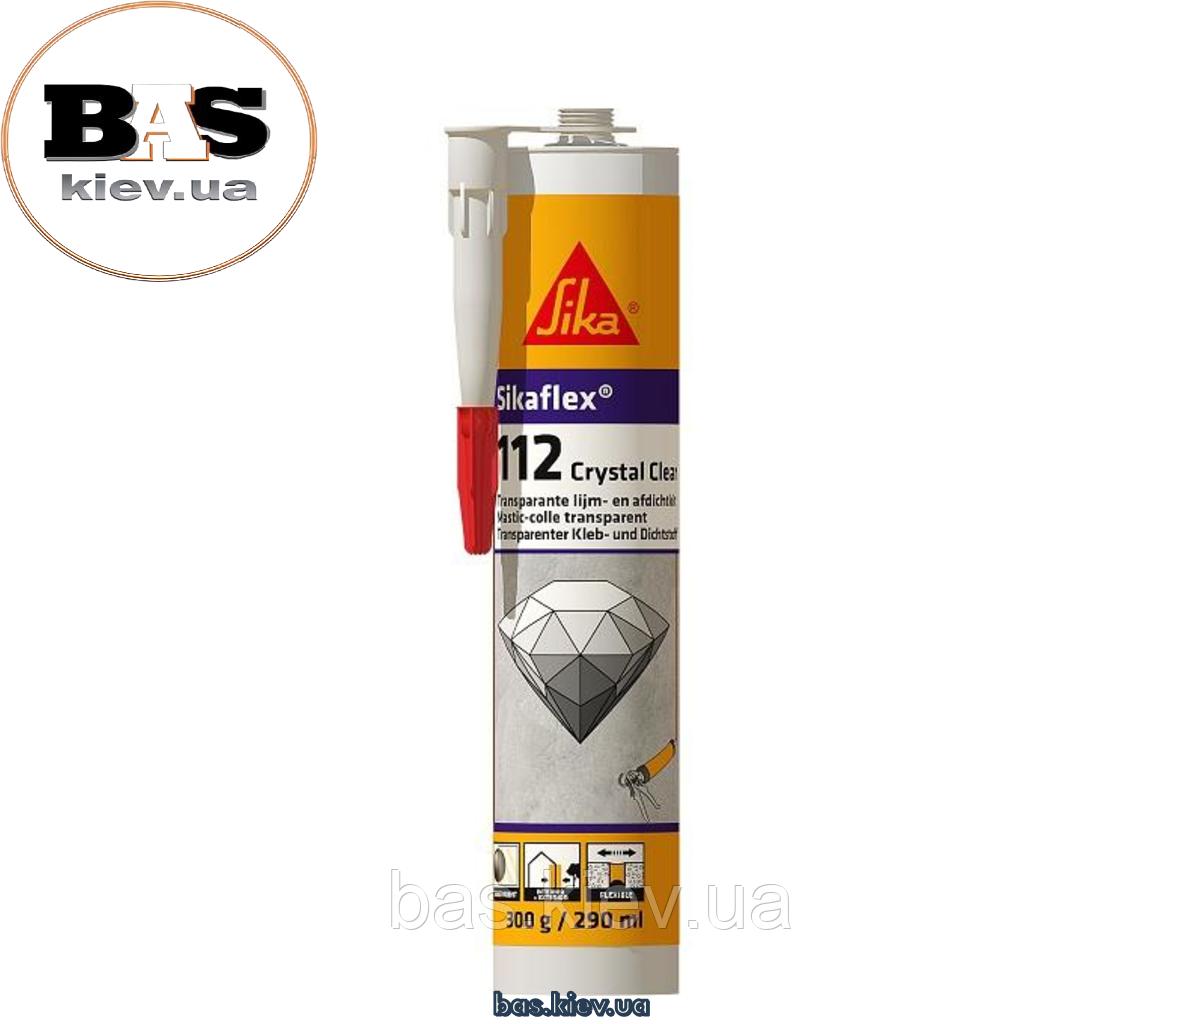 SIKAFLEX®–112 CRYSTAL CLEAR  Прозрачный строительный клей-герметик , 290 мл